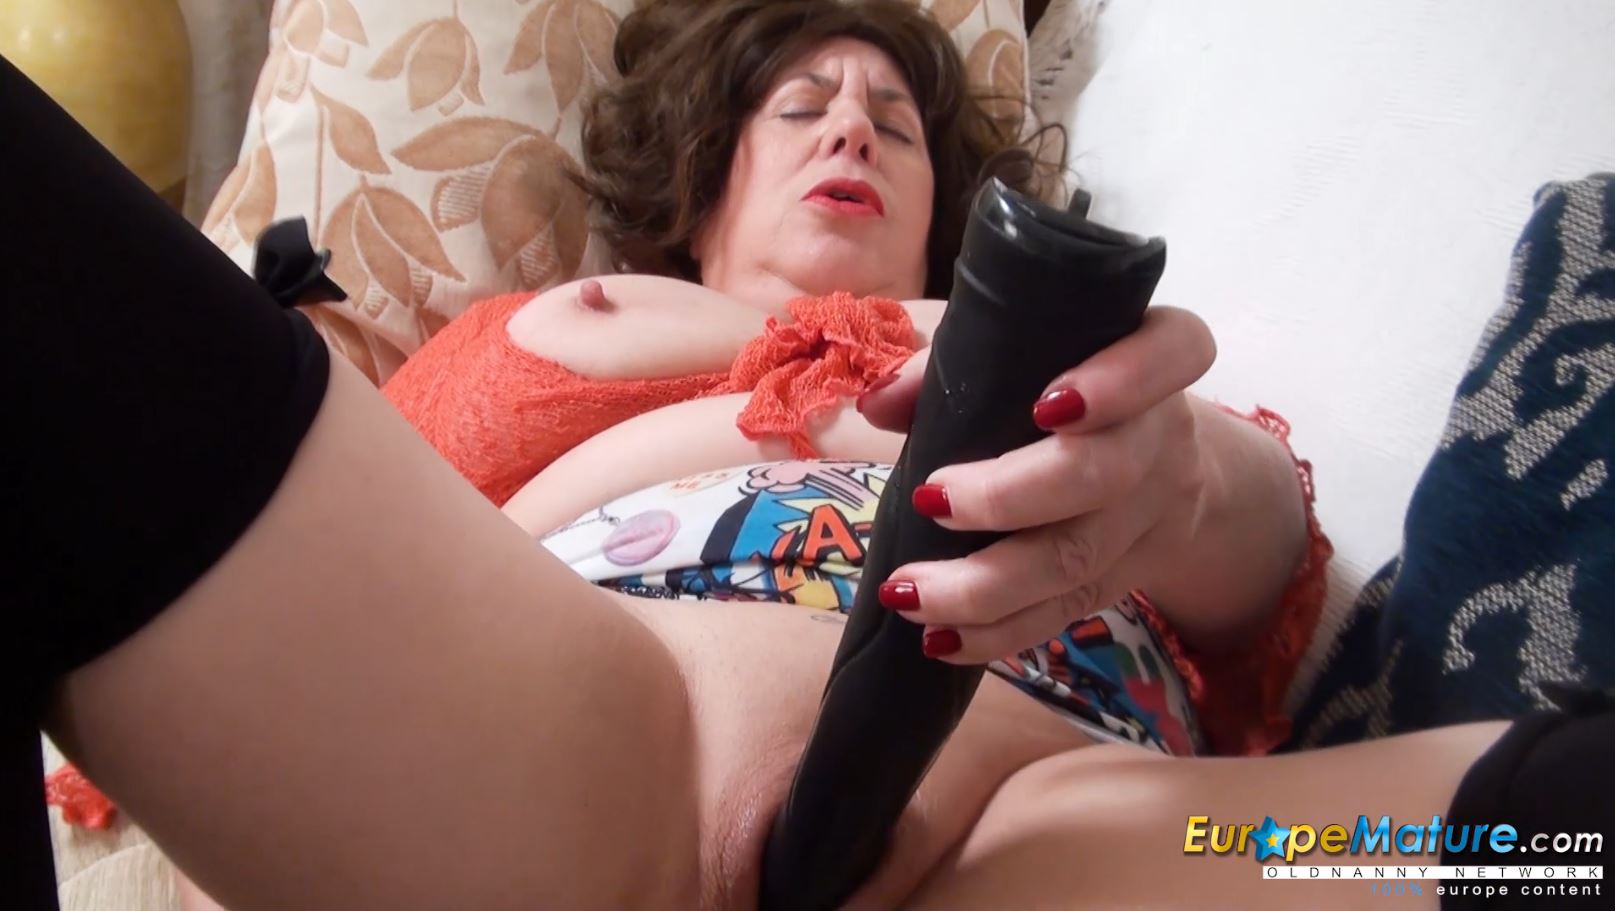 Dad Daughter Watching Porn